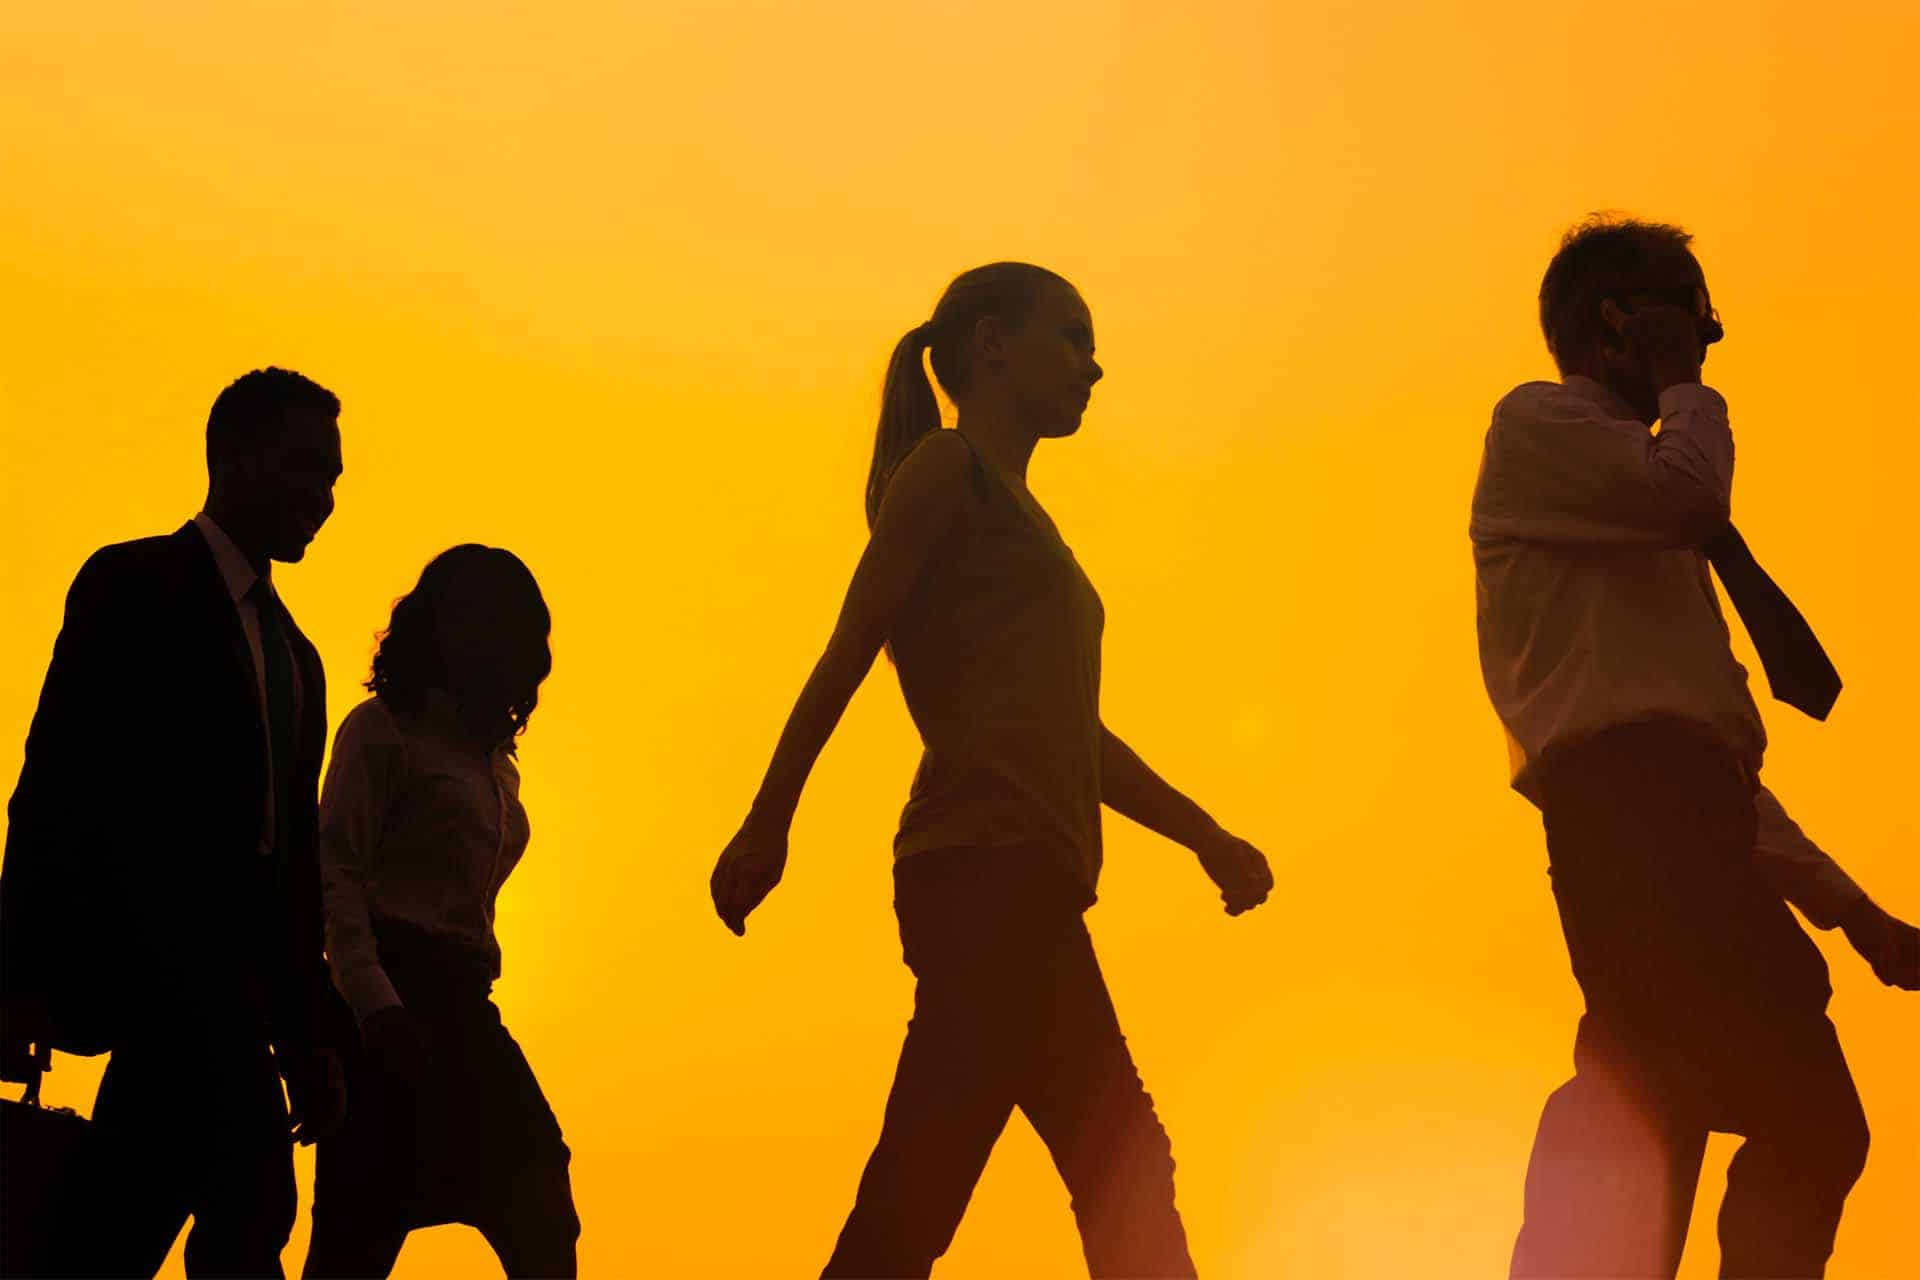 t2informatik Blog: Digital Leadership - Führung in digitalen Zeiten